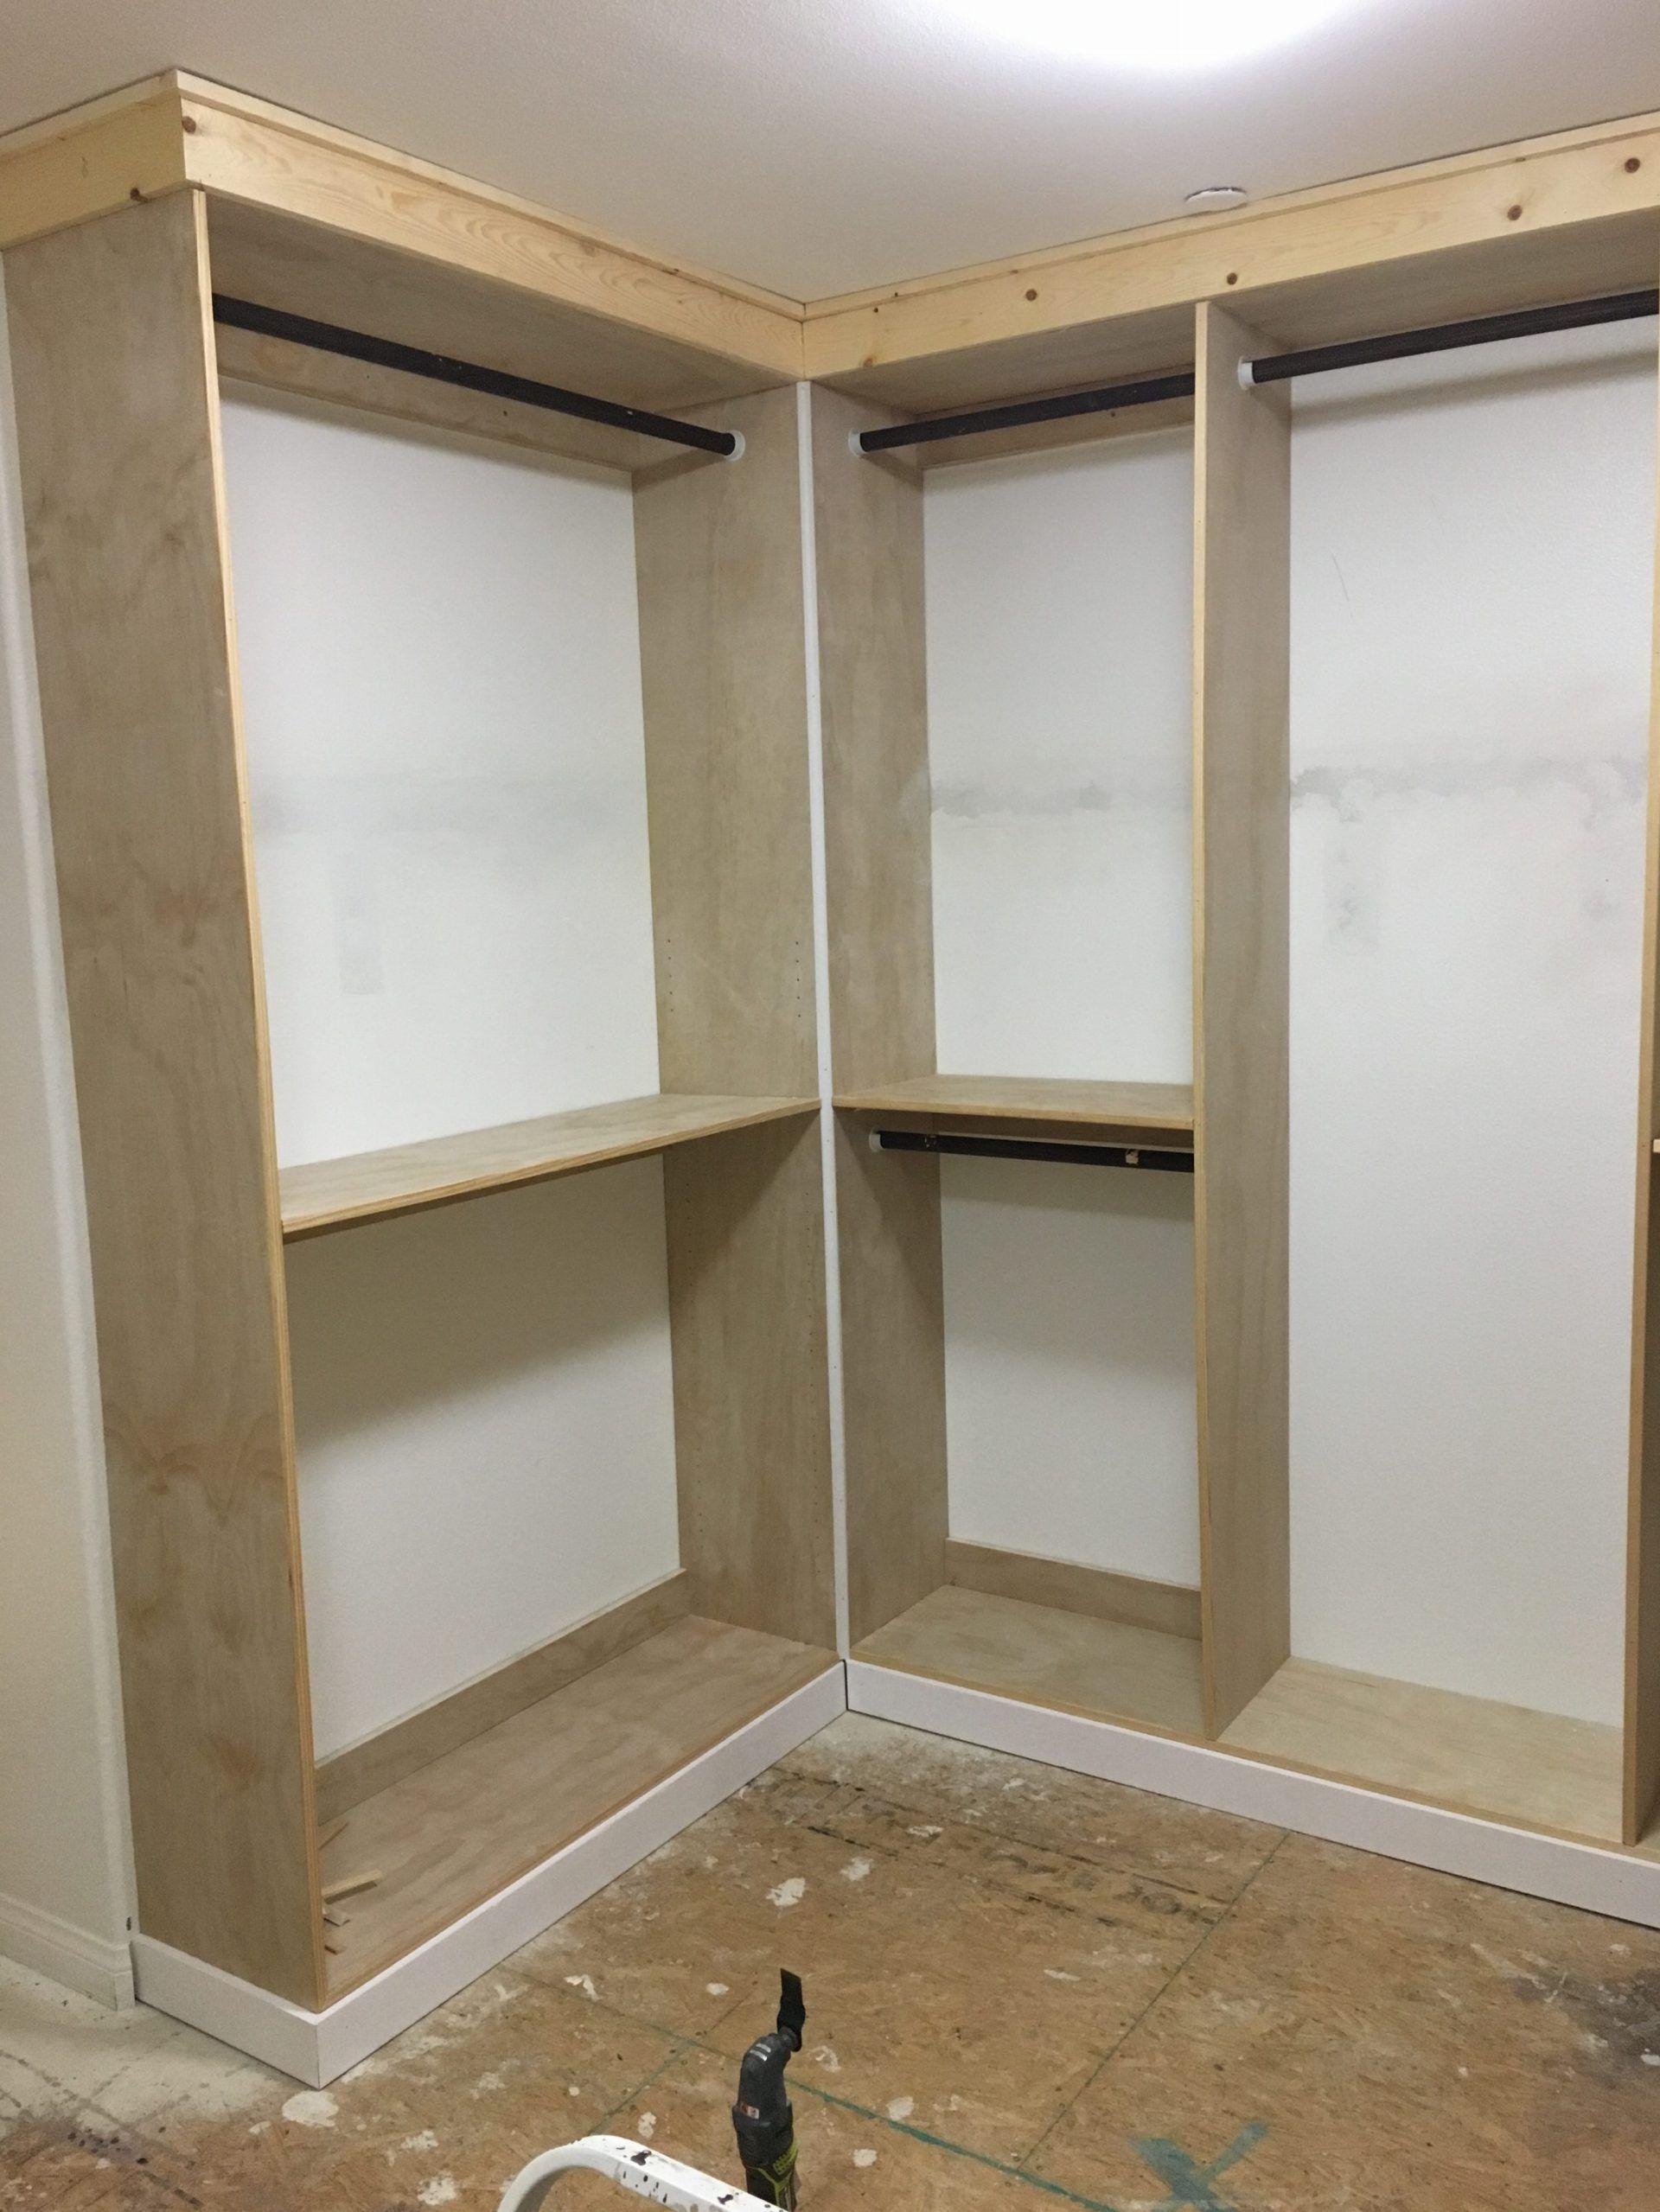 Diy Custom Master Closet Part 3 The Details Build A Closet Closet Remodel Diy Closet Renovation